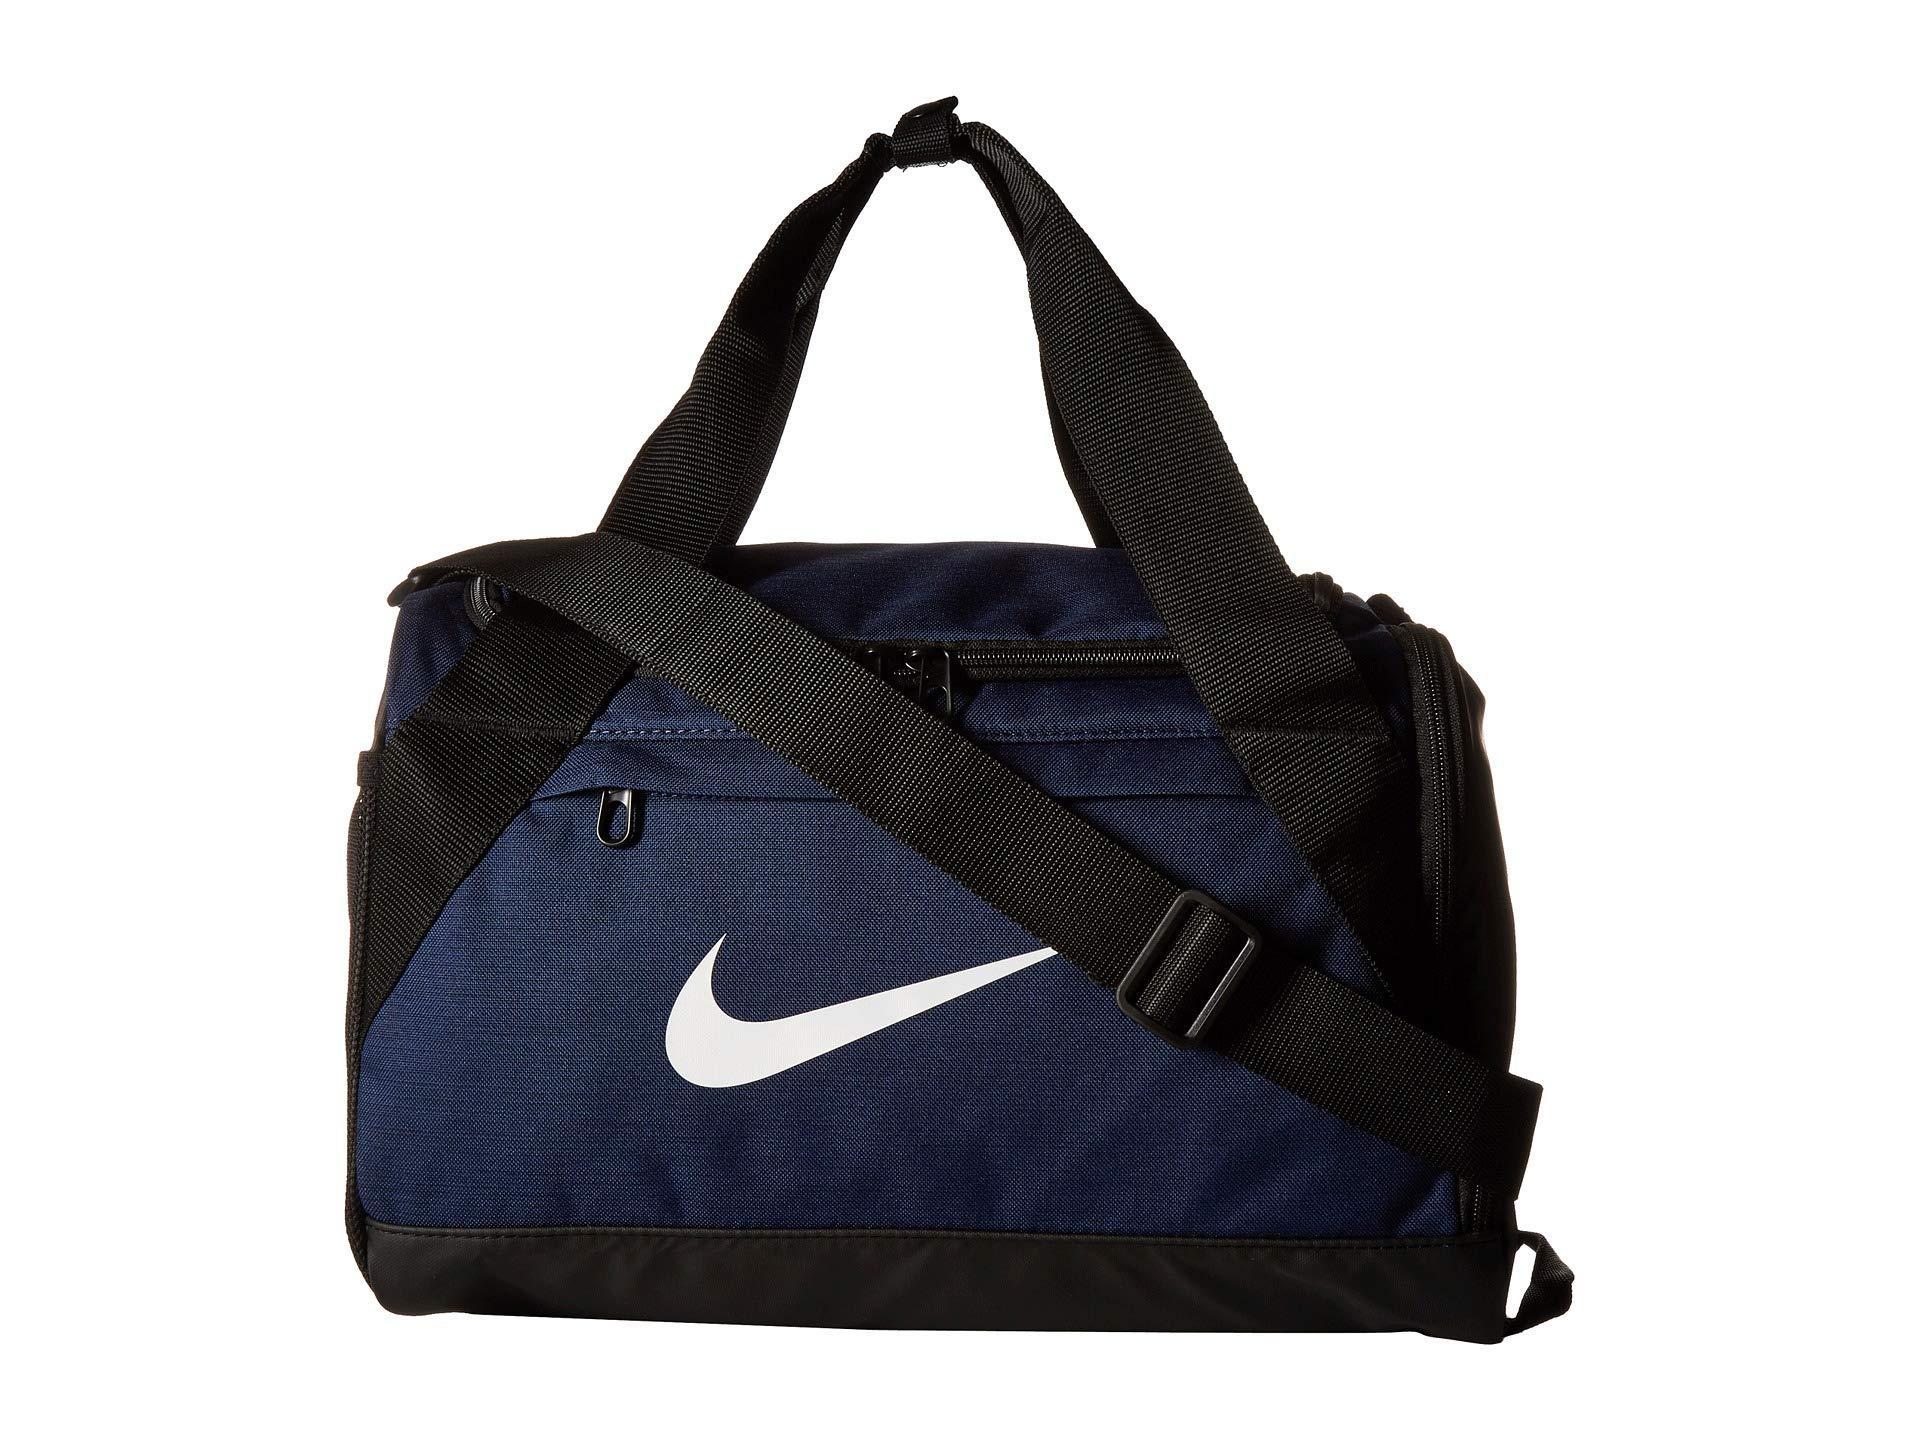 83f1543323 Lyst - Nike Brasilia Extra Small Training Duffel Bag (black black ...